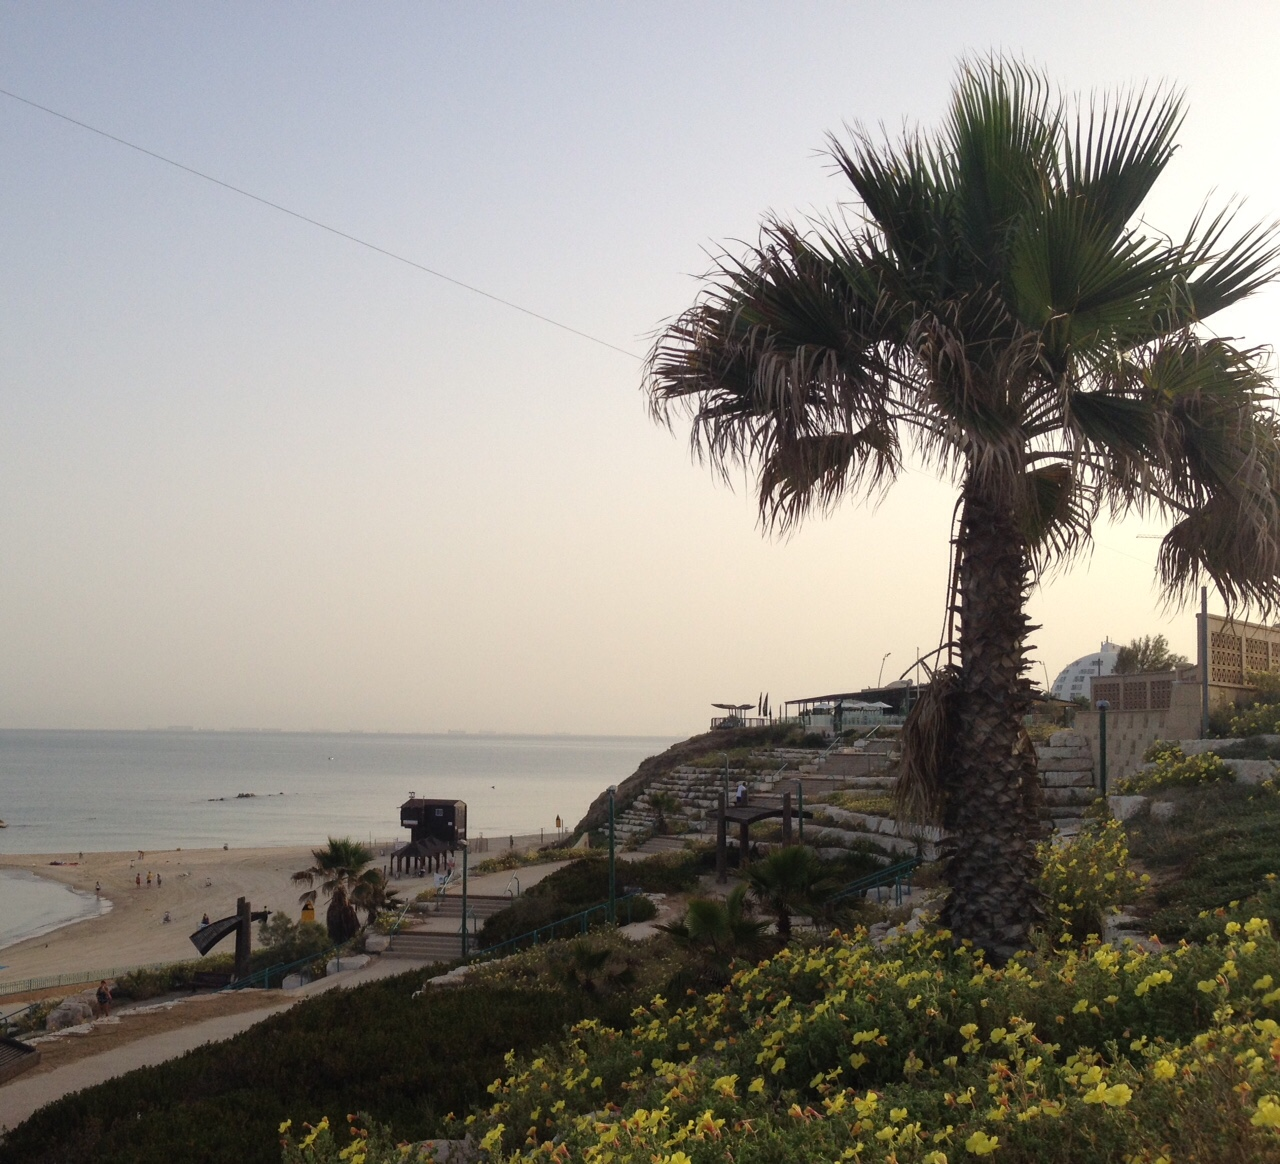 The Ashkelon beach